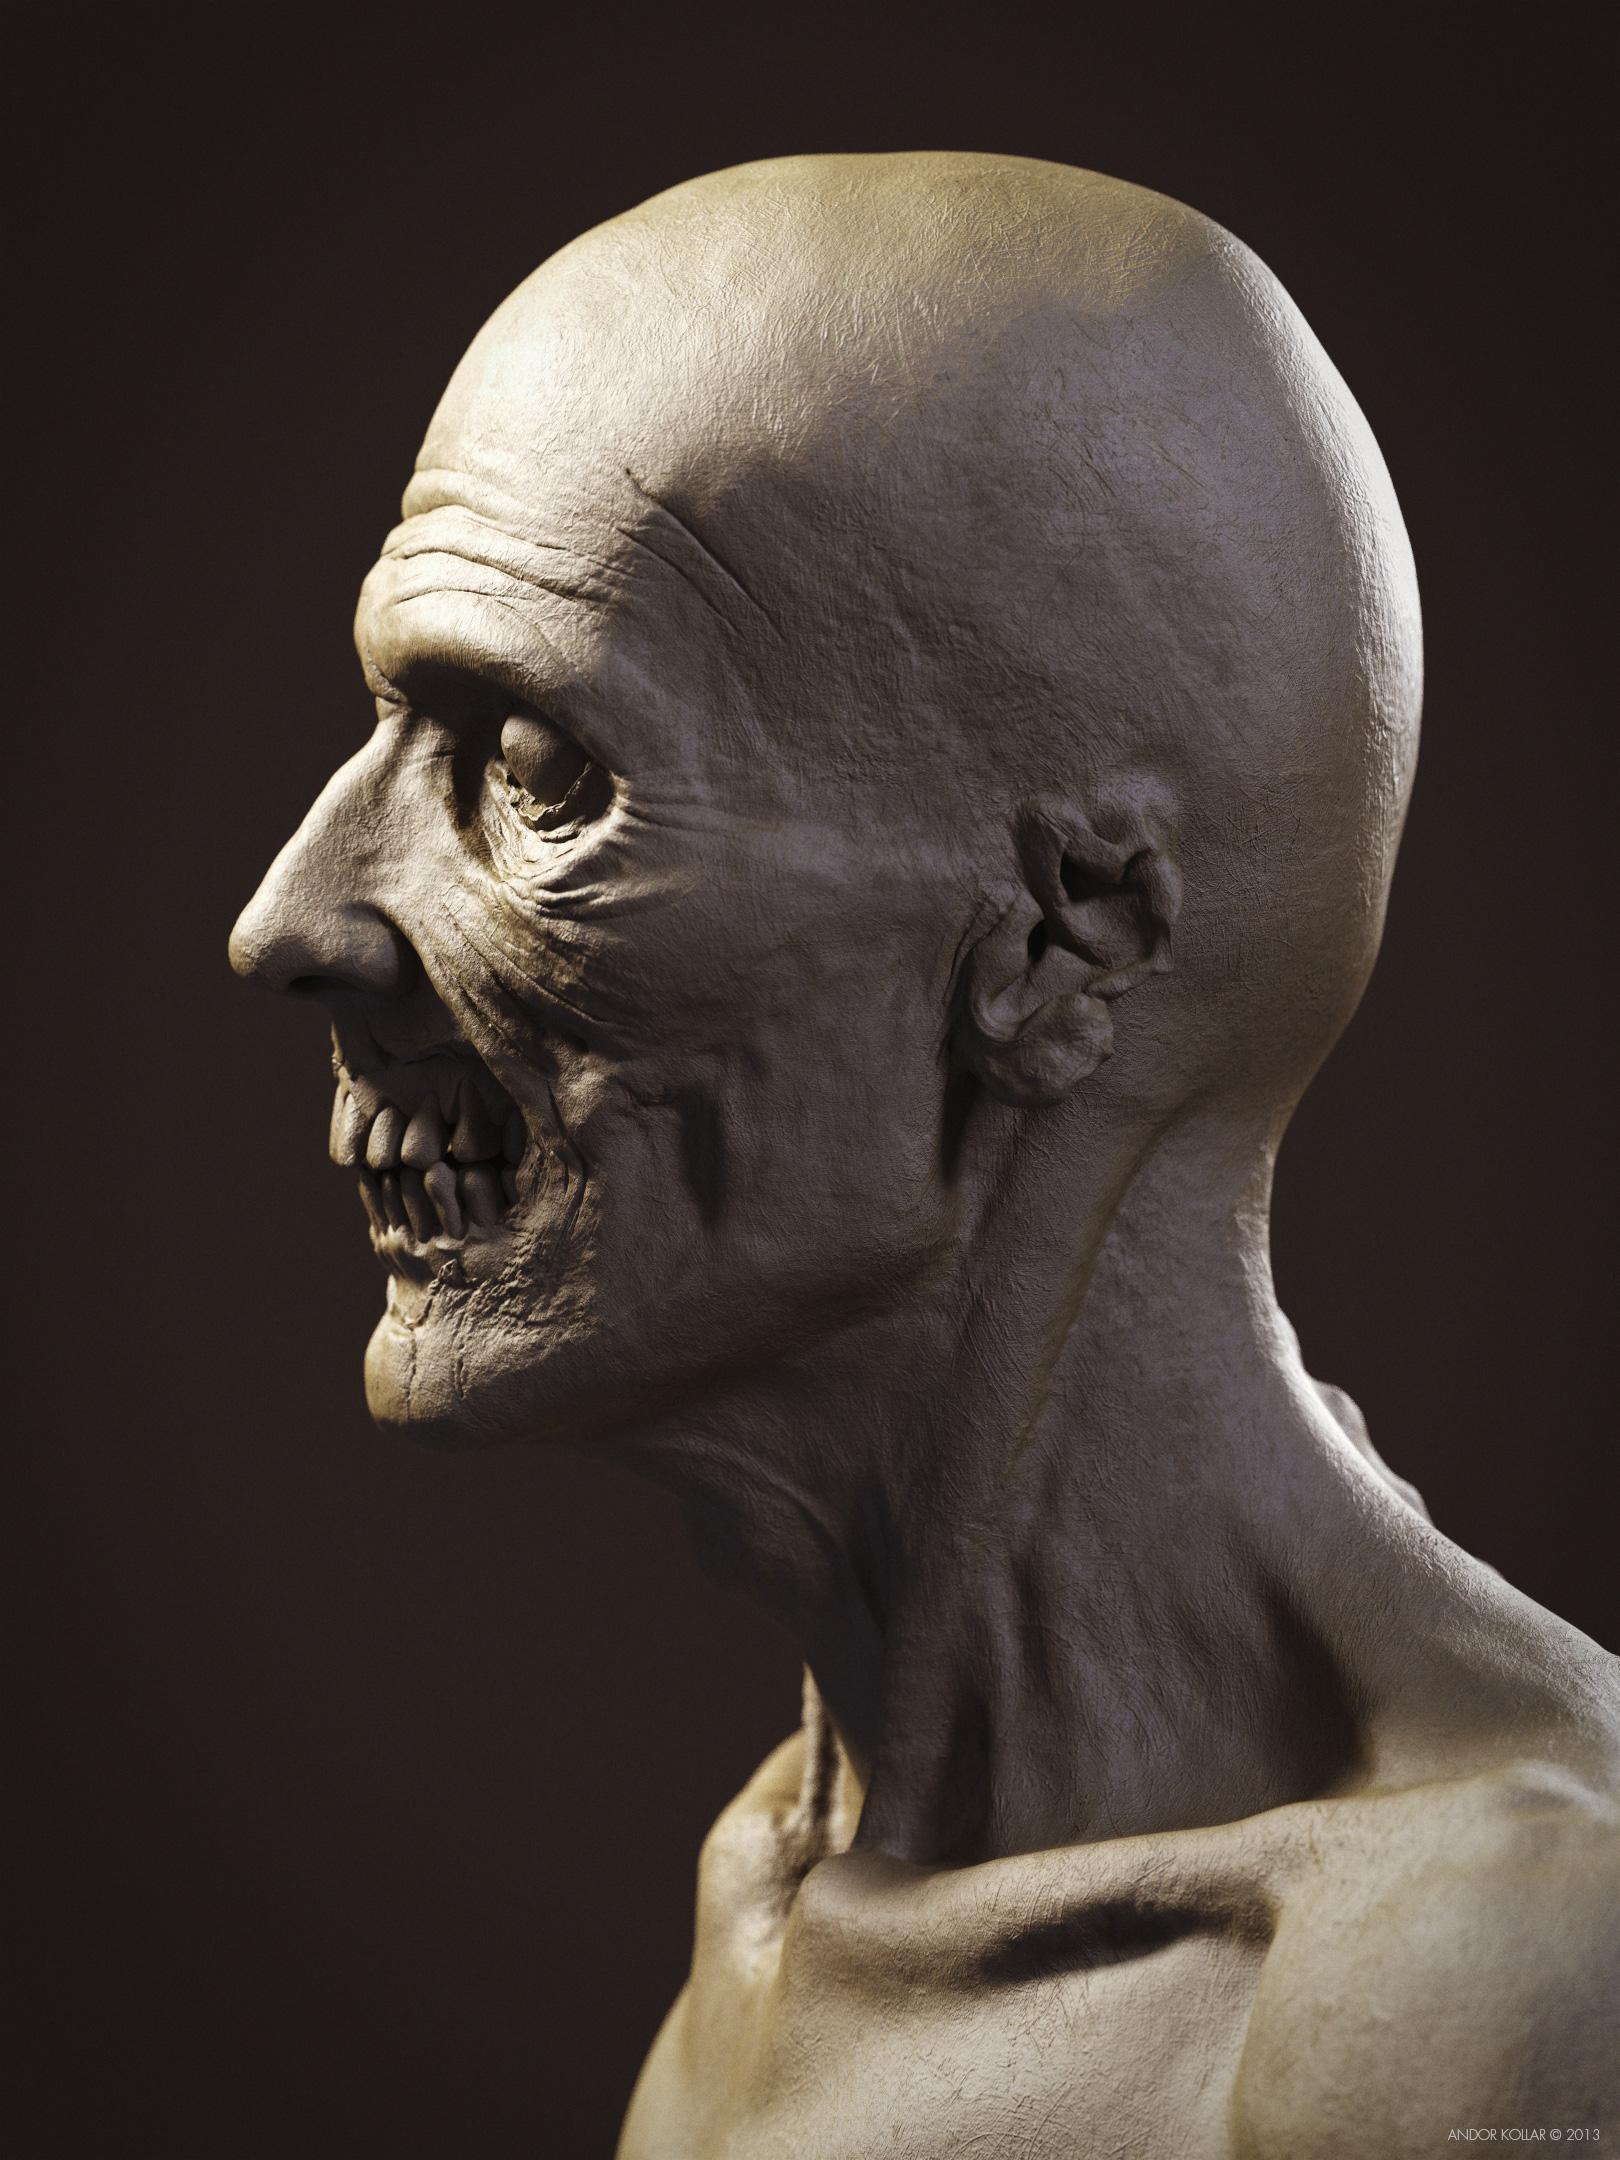 Undead Skull Zombie ZBrush Keyshot